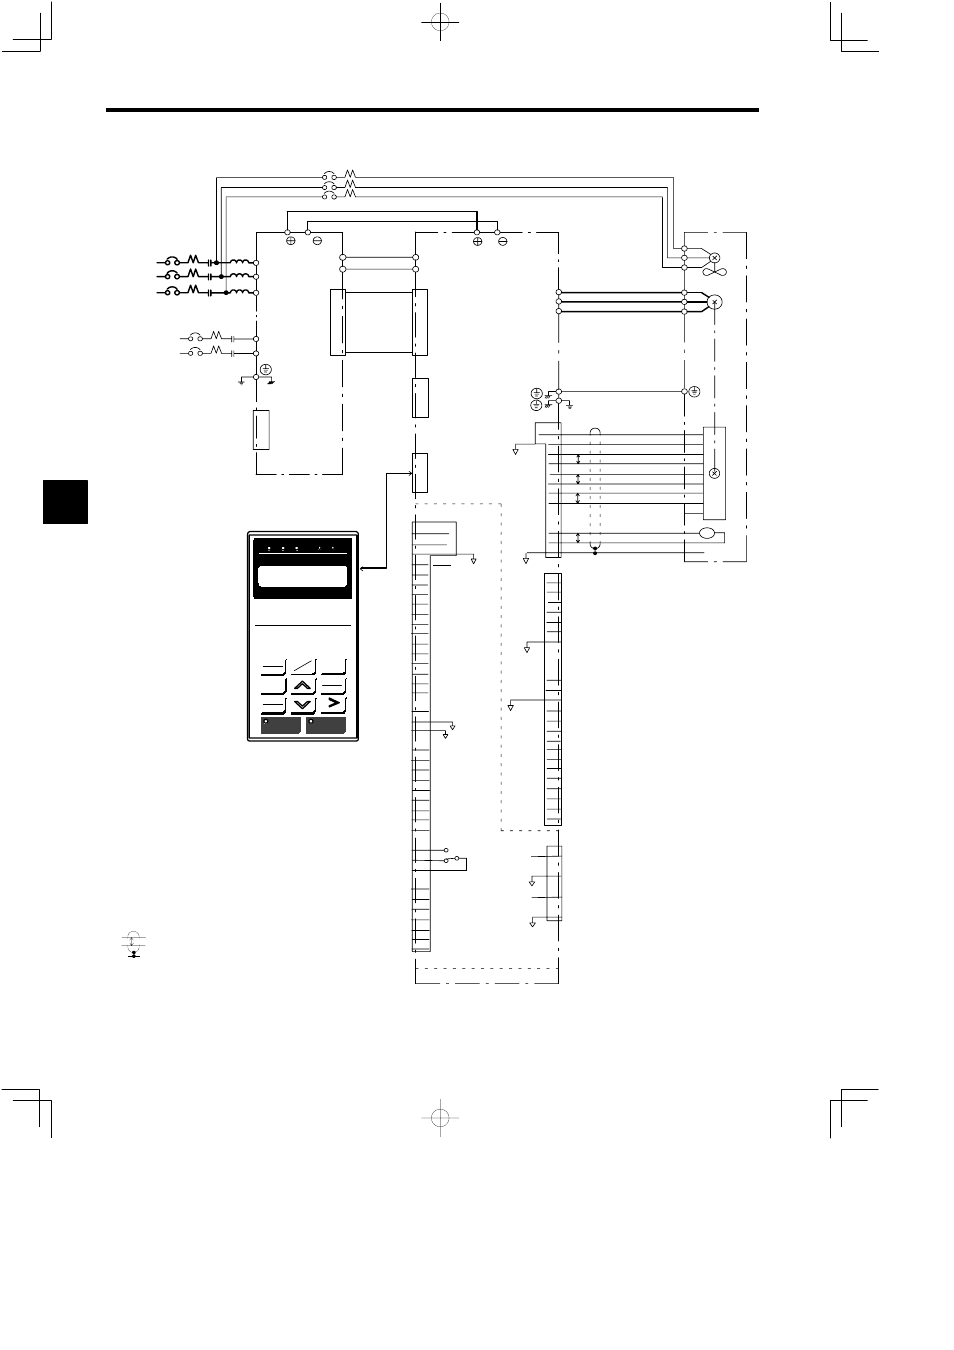 Appendix | Yaskawa Varisd 626M5 User Manual | Page 298 / 305 on